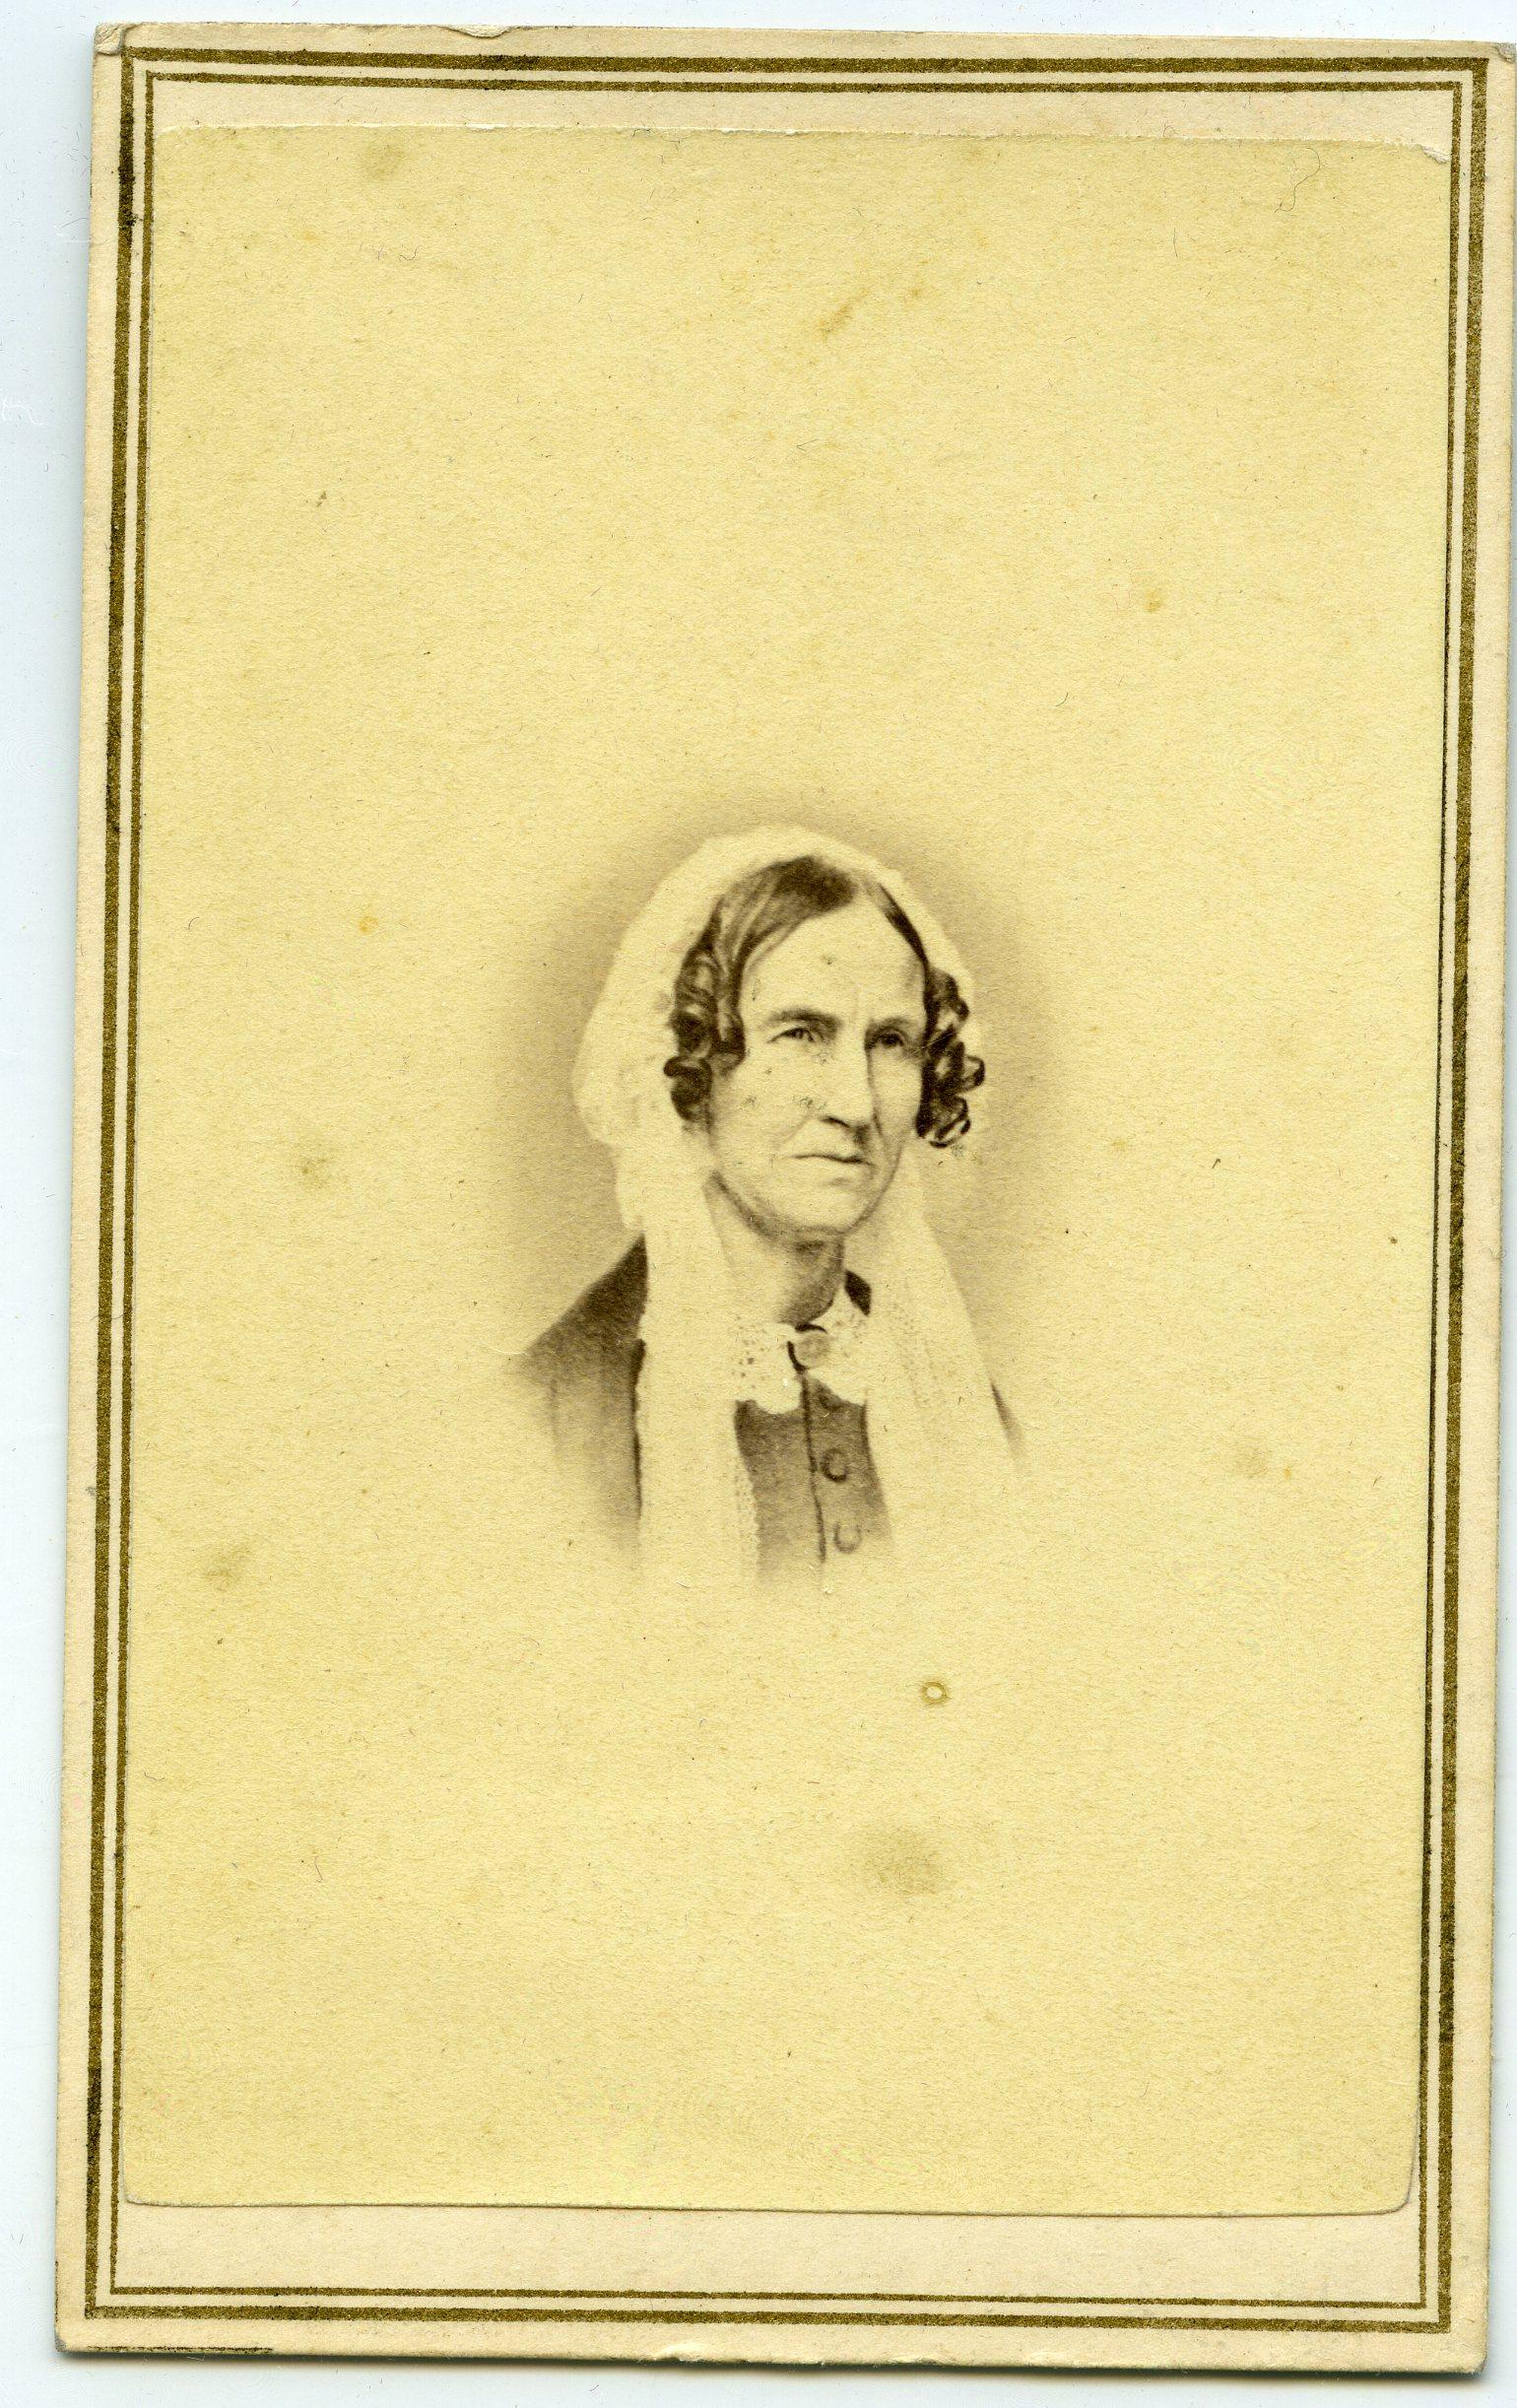 DateiCarte De Visite Portrait Of Orra White Hitchcock Ca 1860